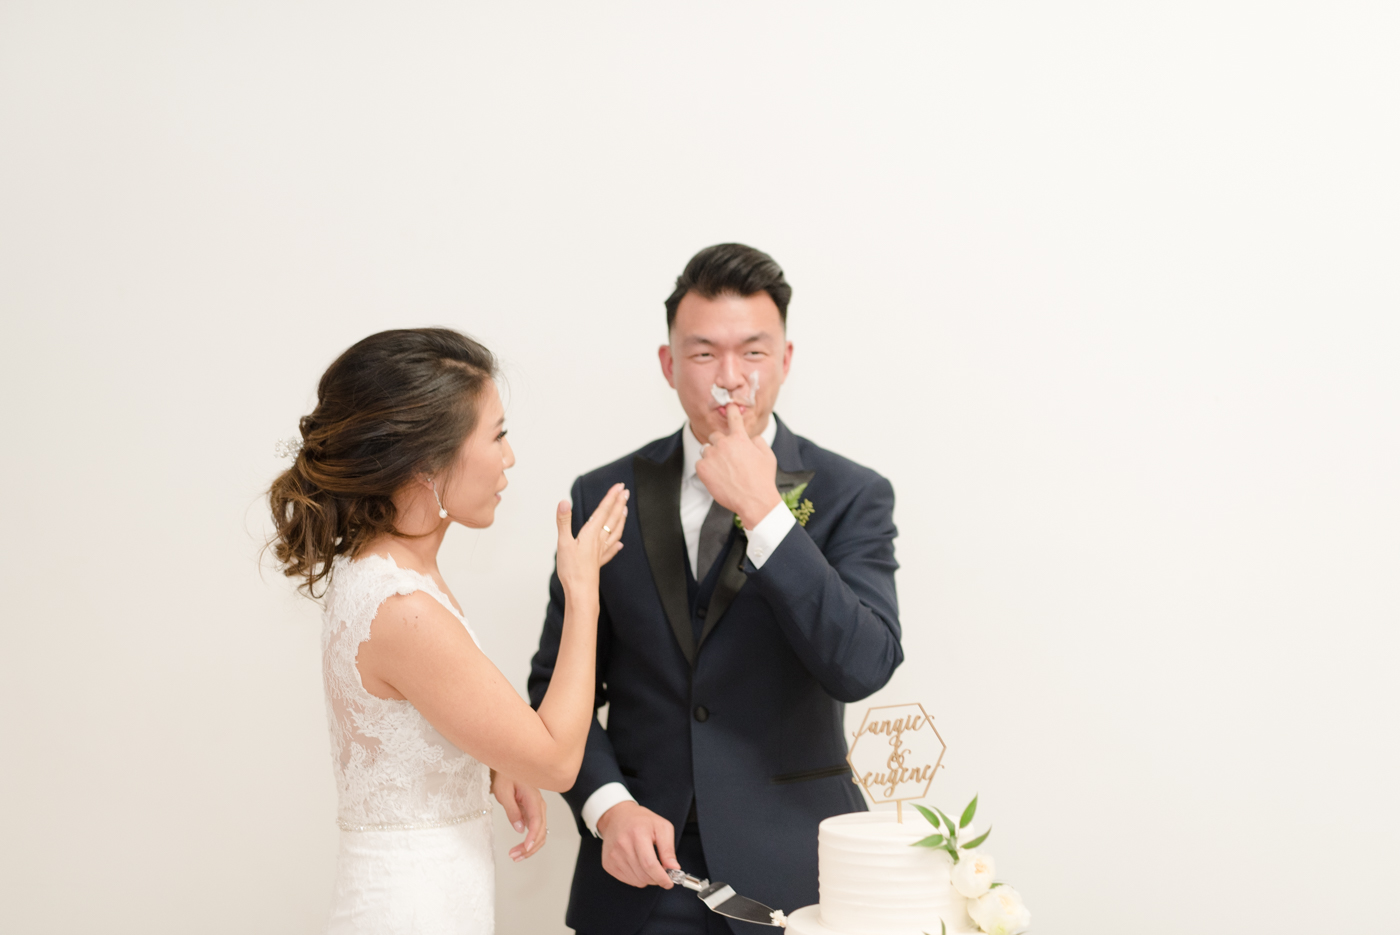 Modern_Wedding_HNYPT_Honeypot_LA_Photographer_Los_Angeles-59.jpg